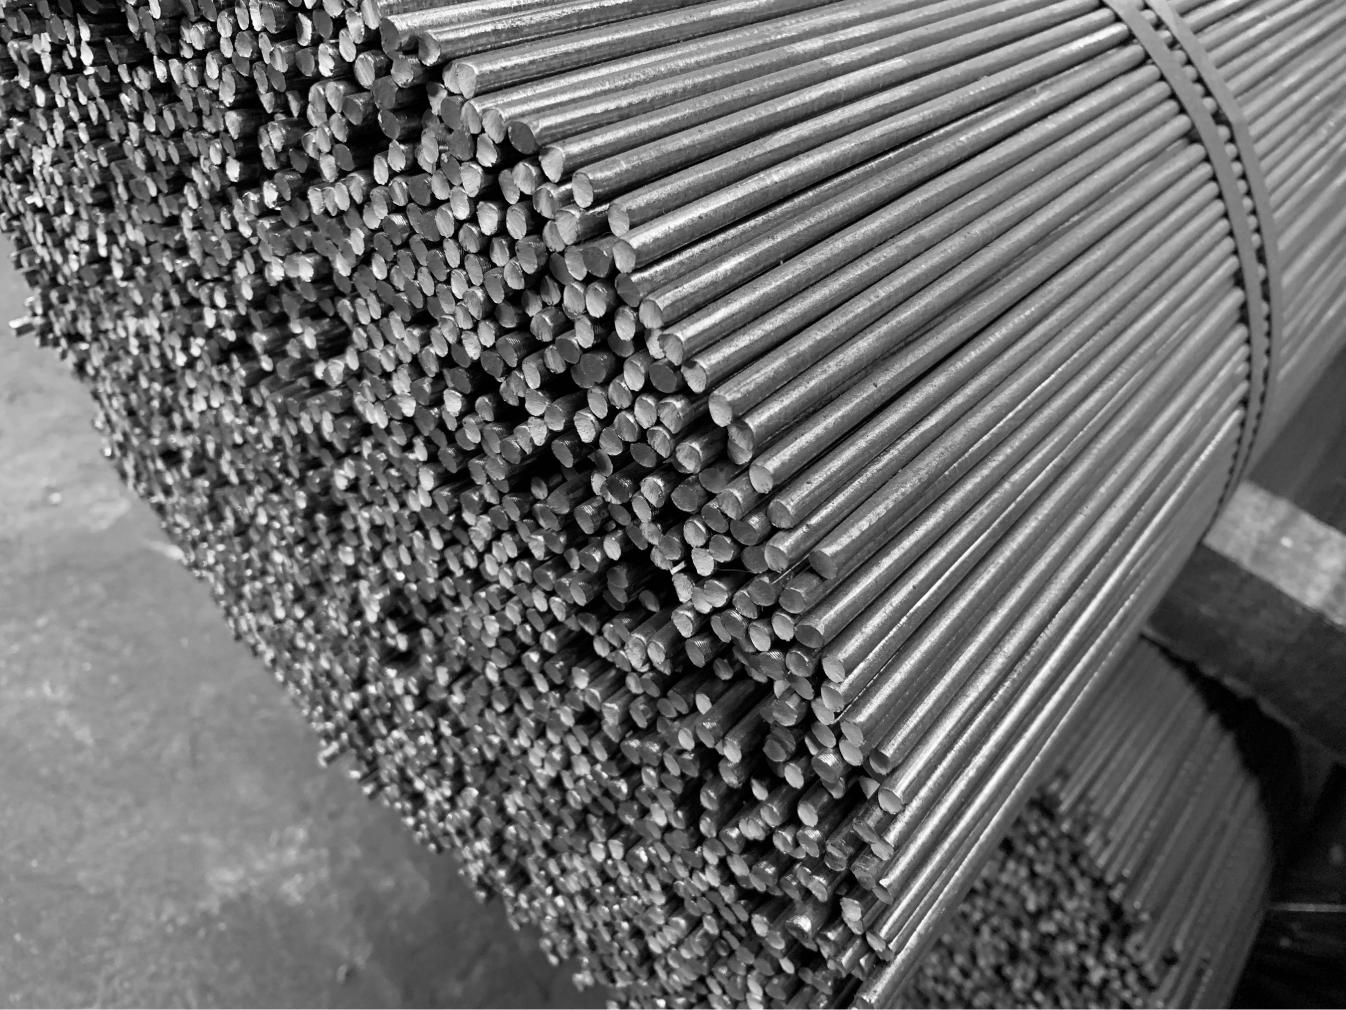 Steel Reinforcement Fabrication Specialists - Hickman & Love